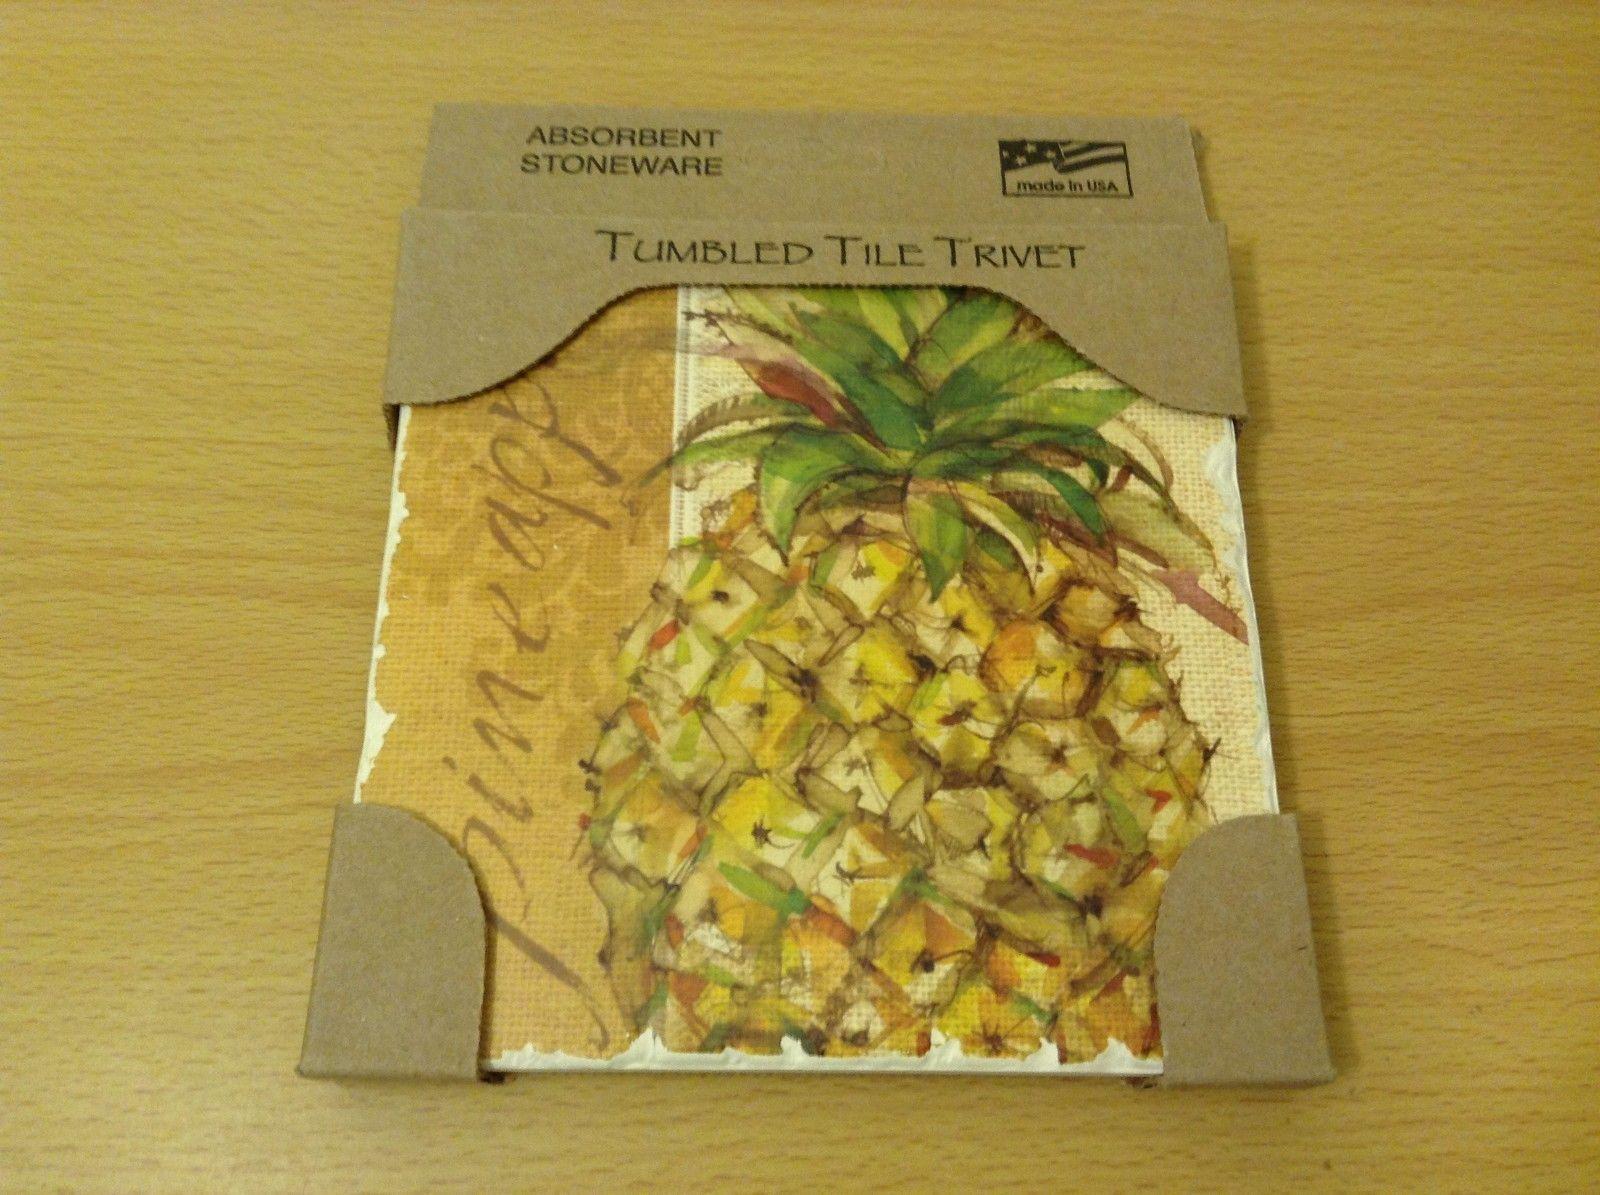 Tumbled Tile Trivet Large Coasters Absorbent Stoneware Natural Cork Back